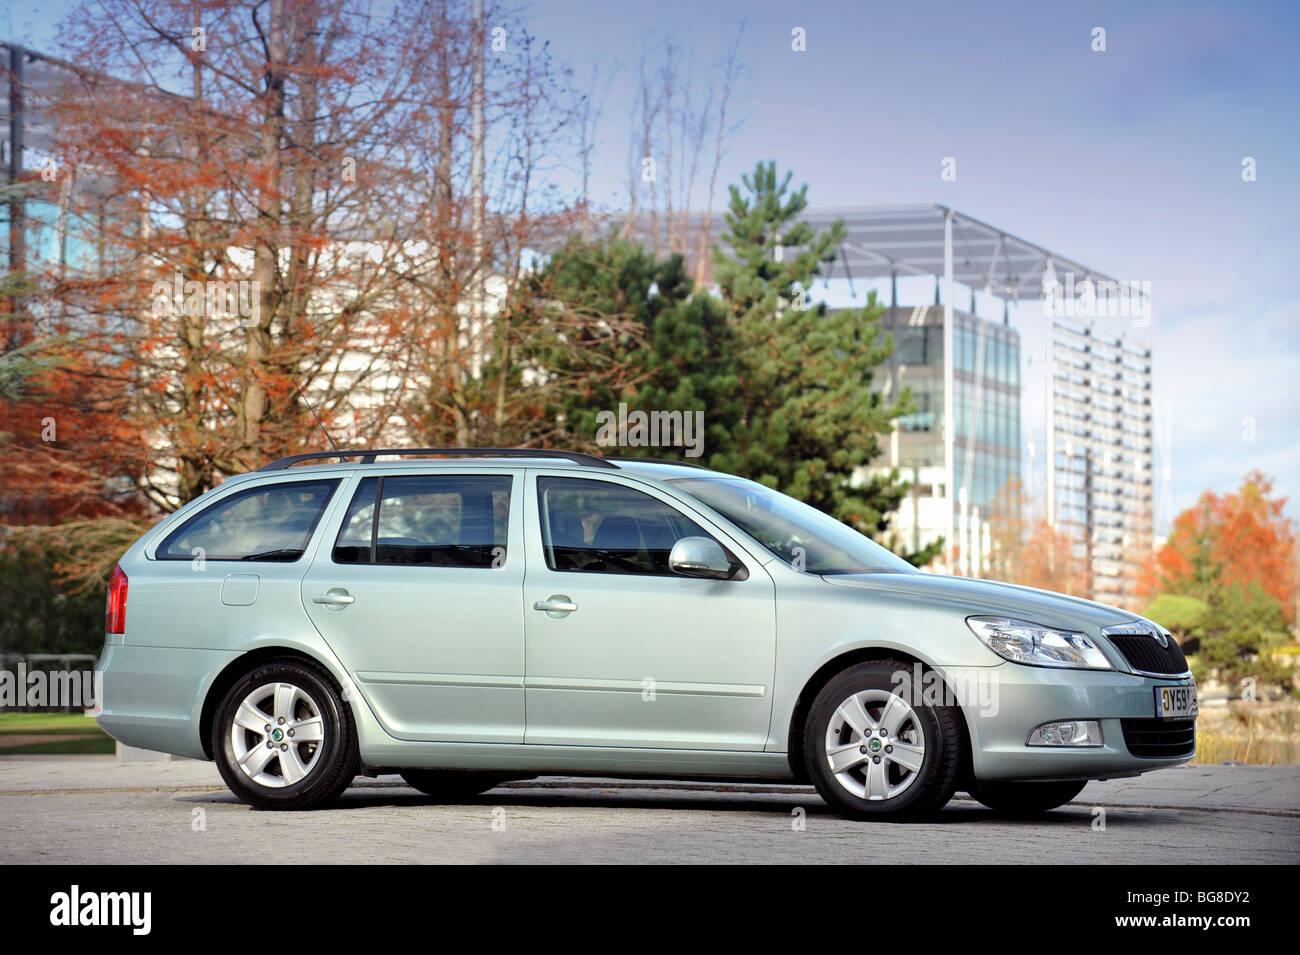 2009 Skoda Octavia greenline estate car - Stock Image